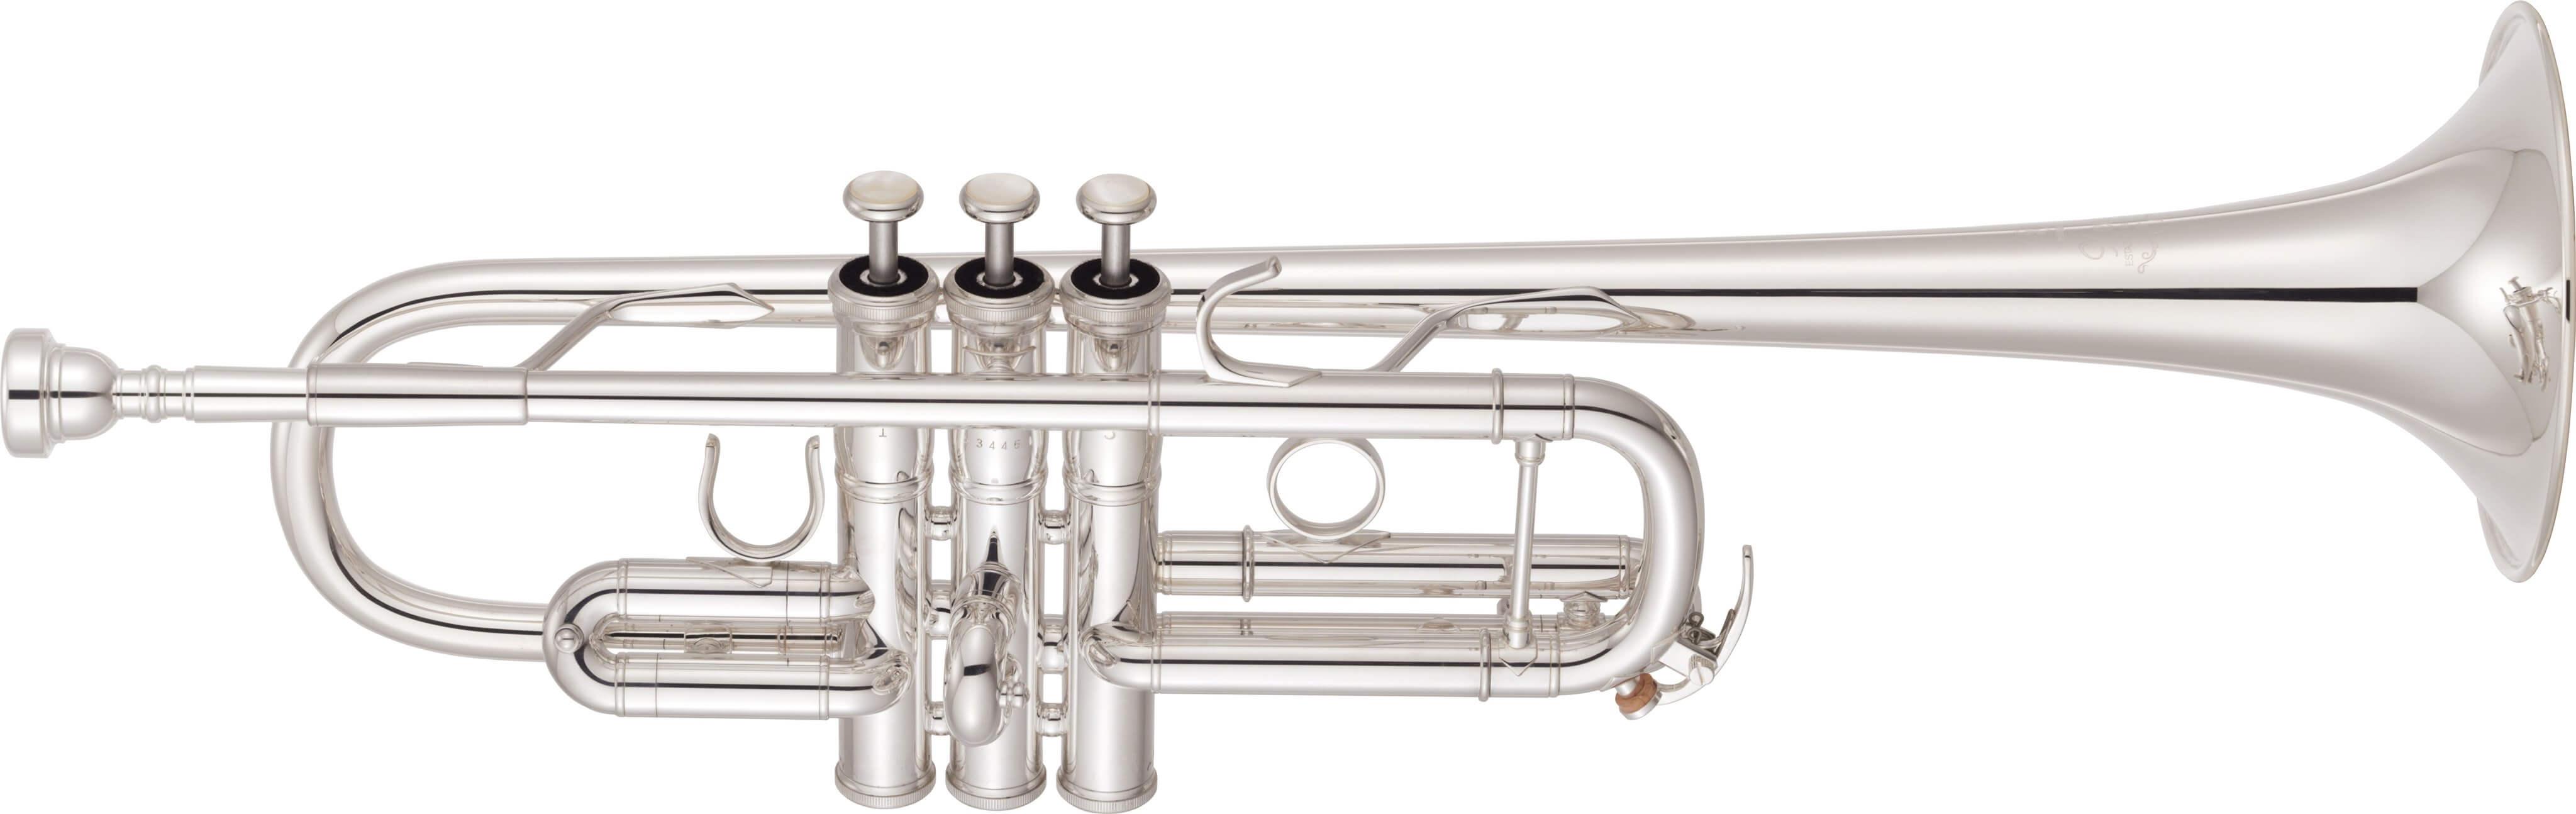 Trompeta en Do Yamaha Ytr-8445GS 04 Plateada